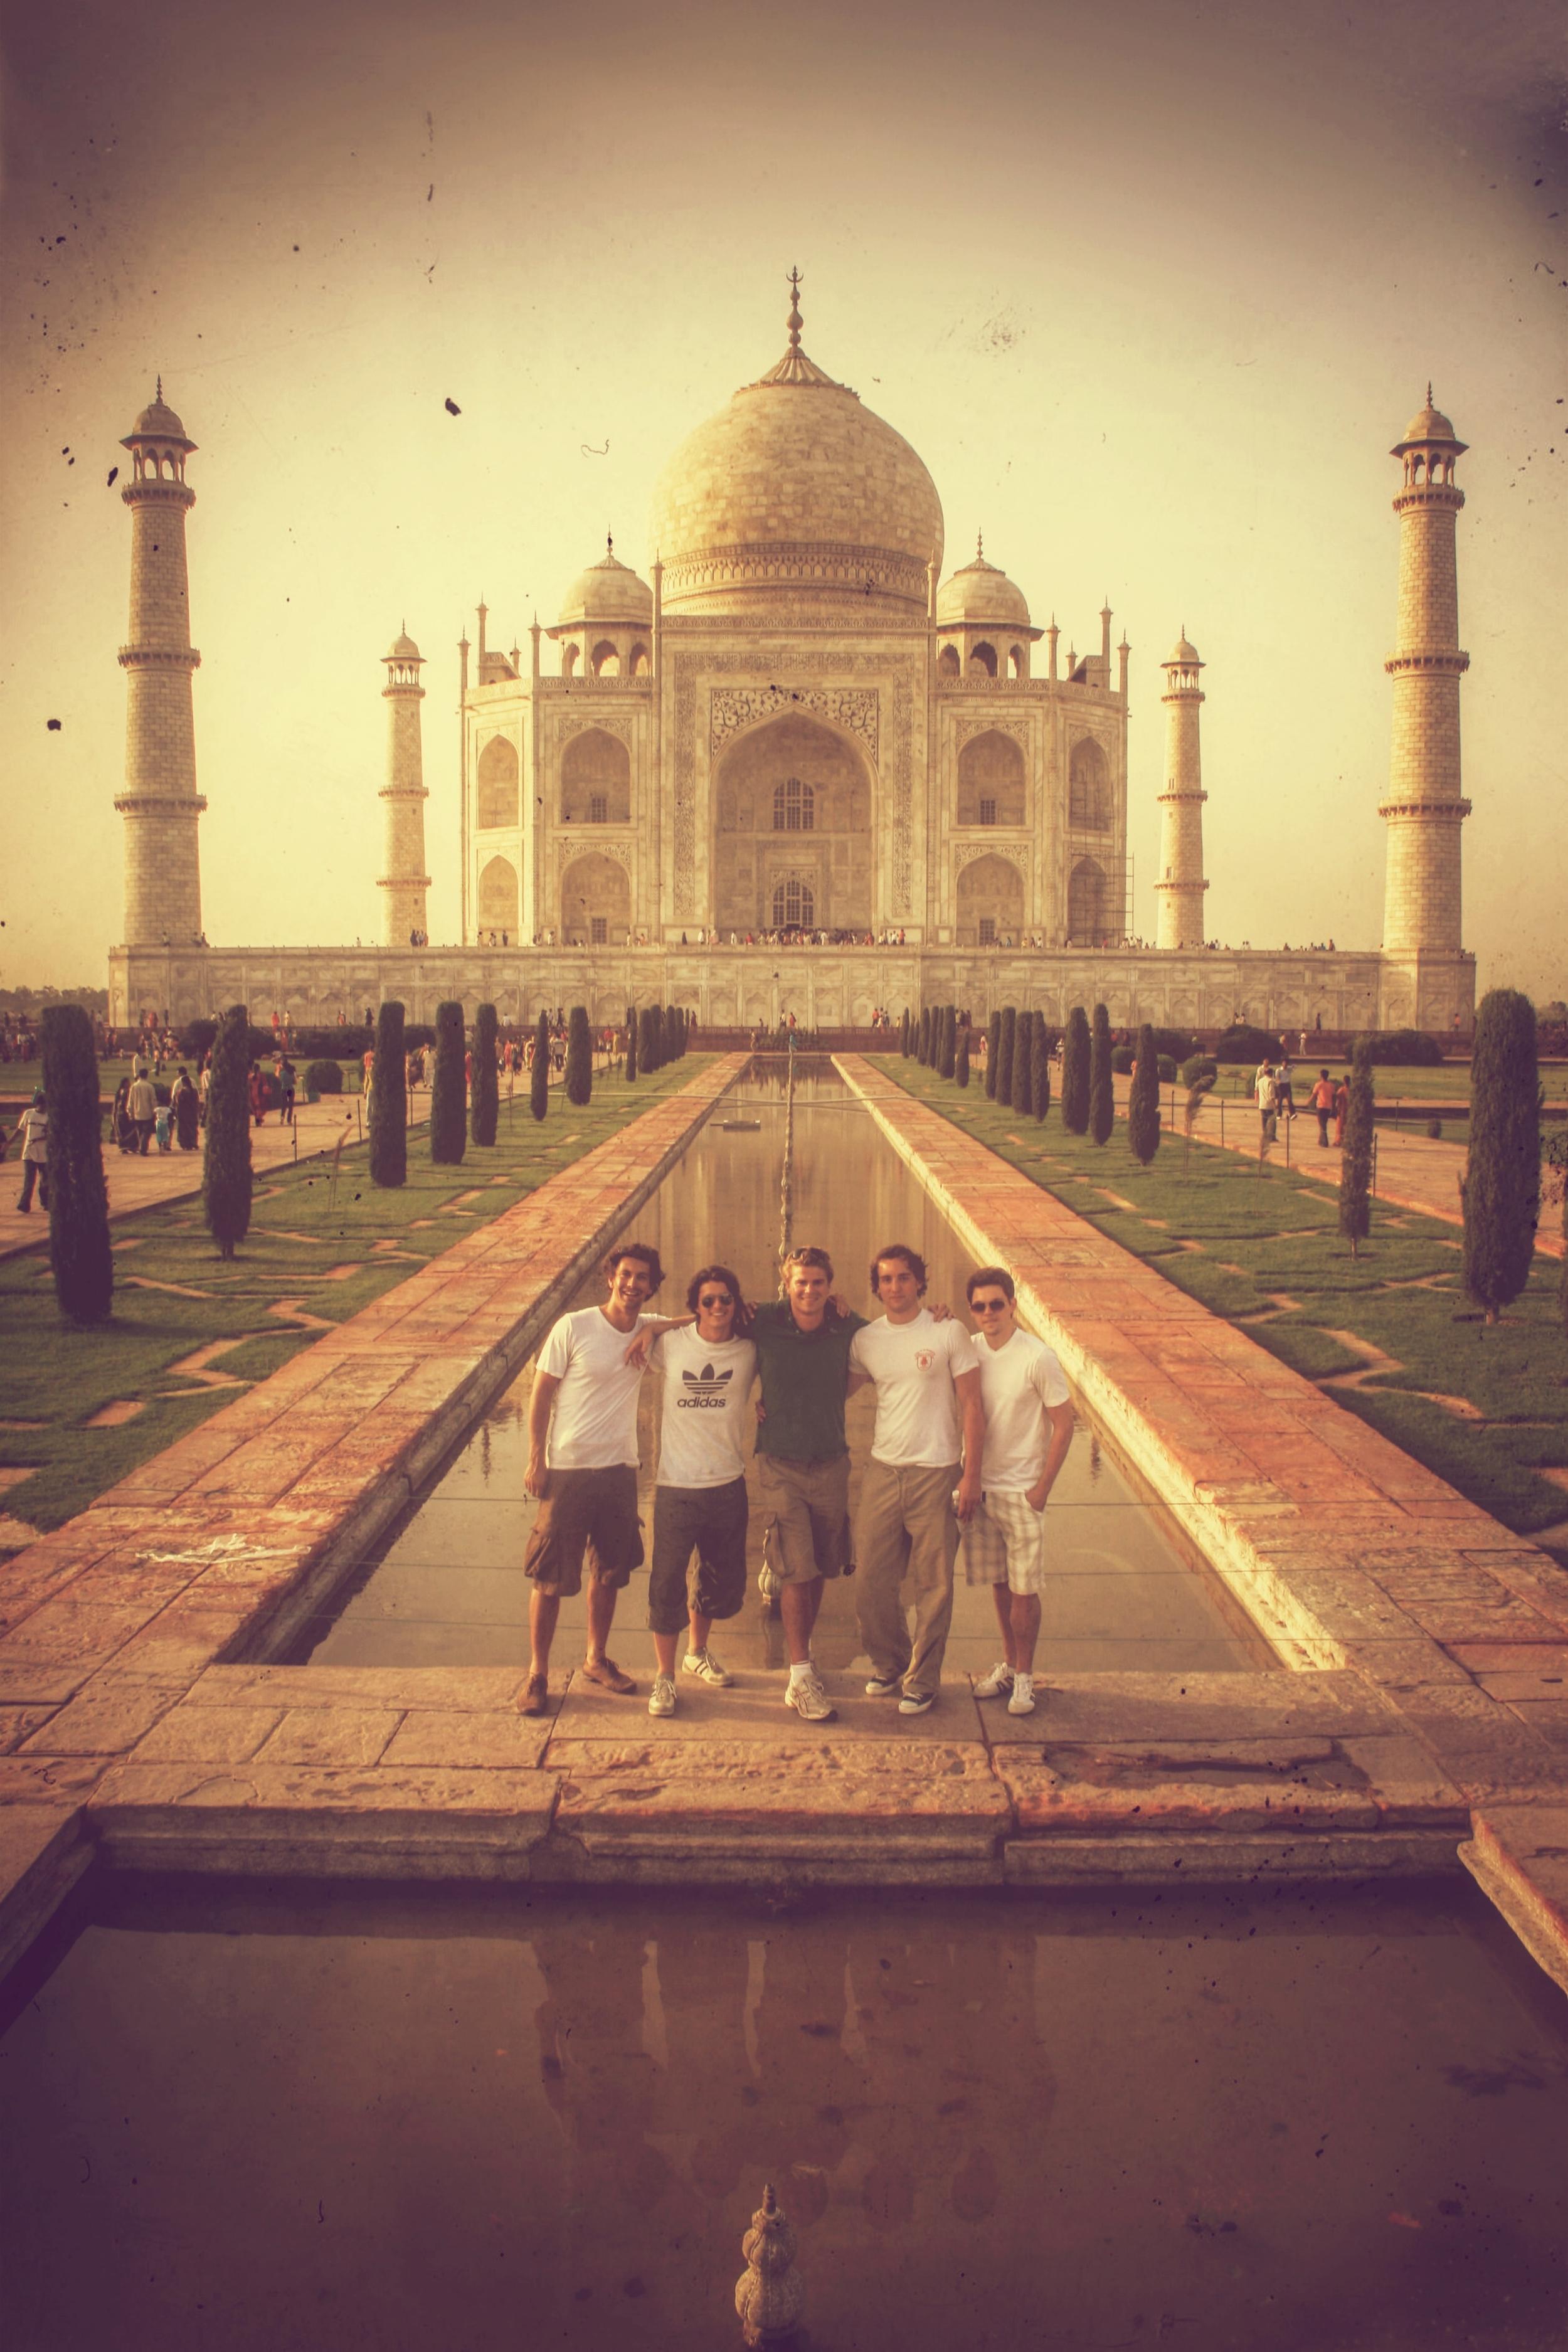 Agra, India (2008)